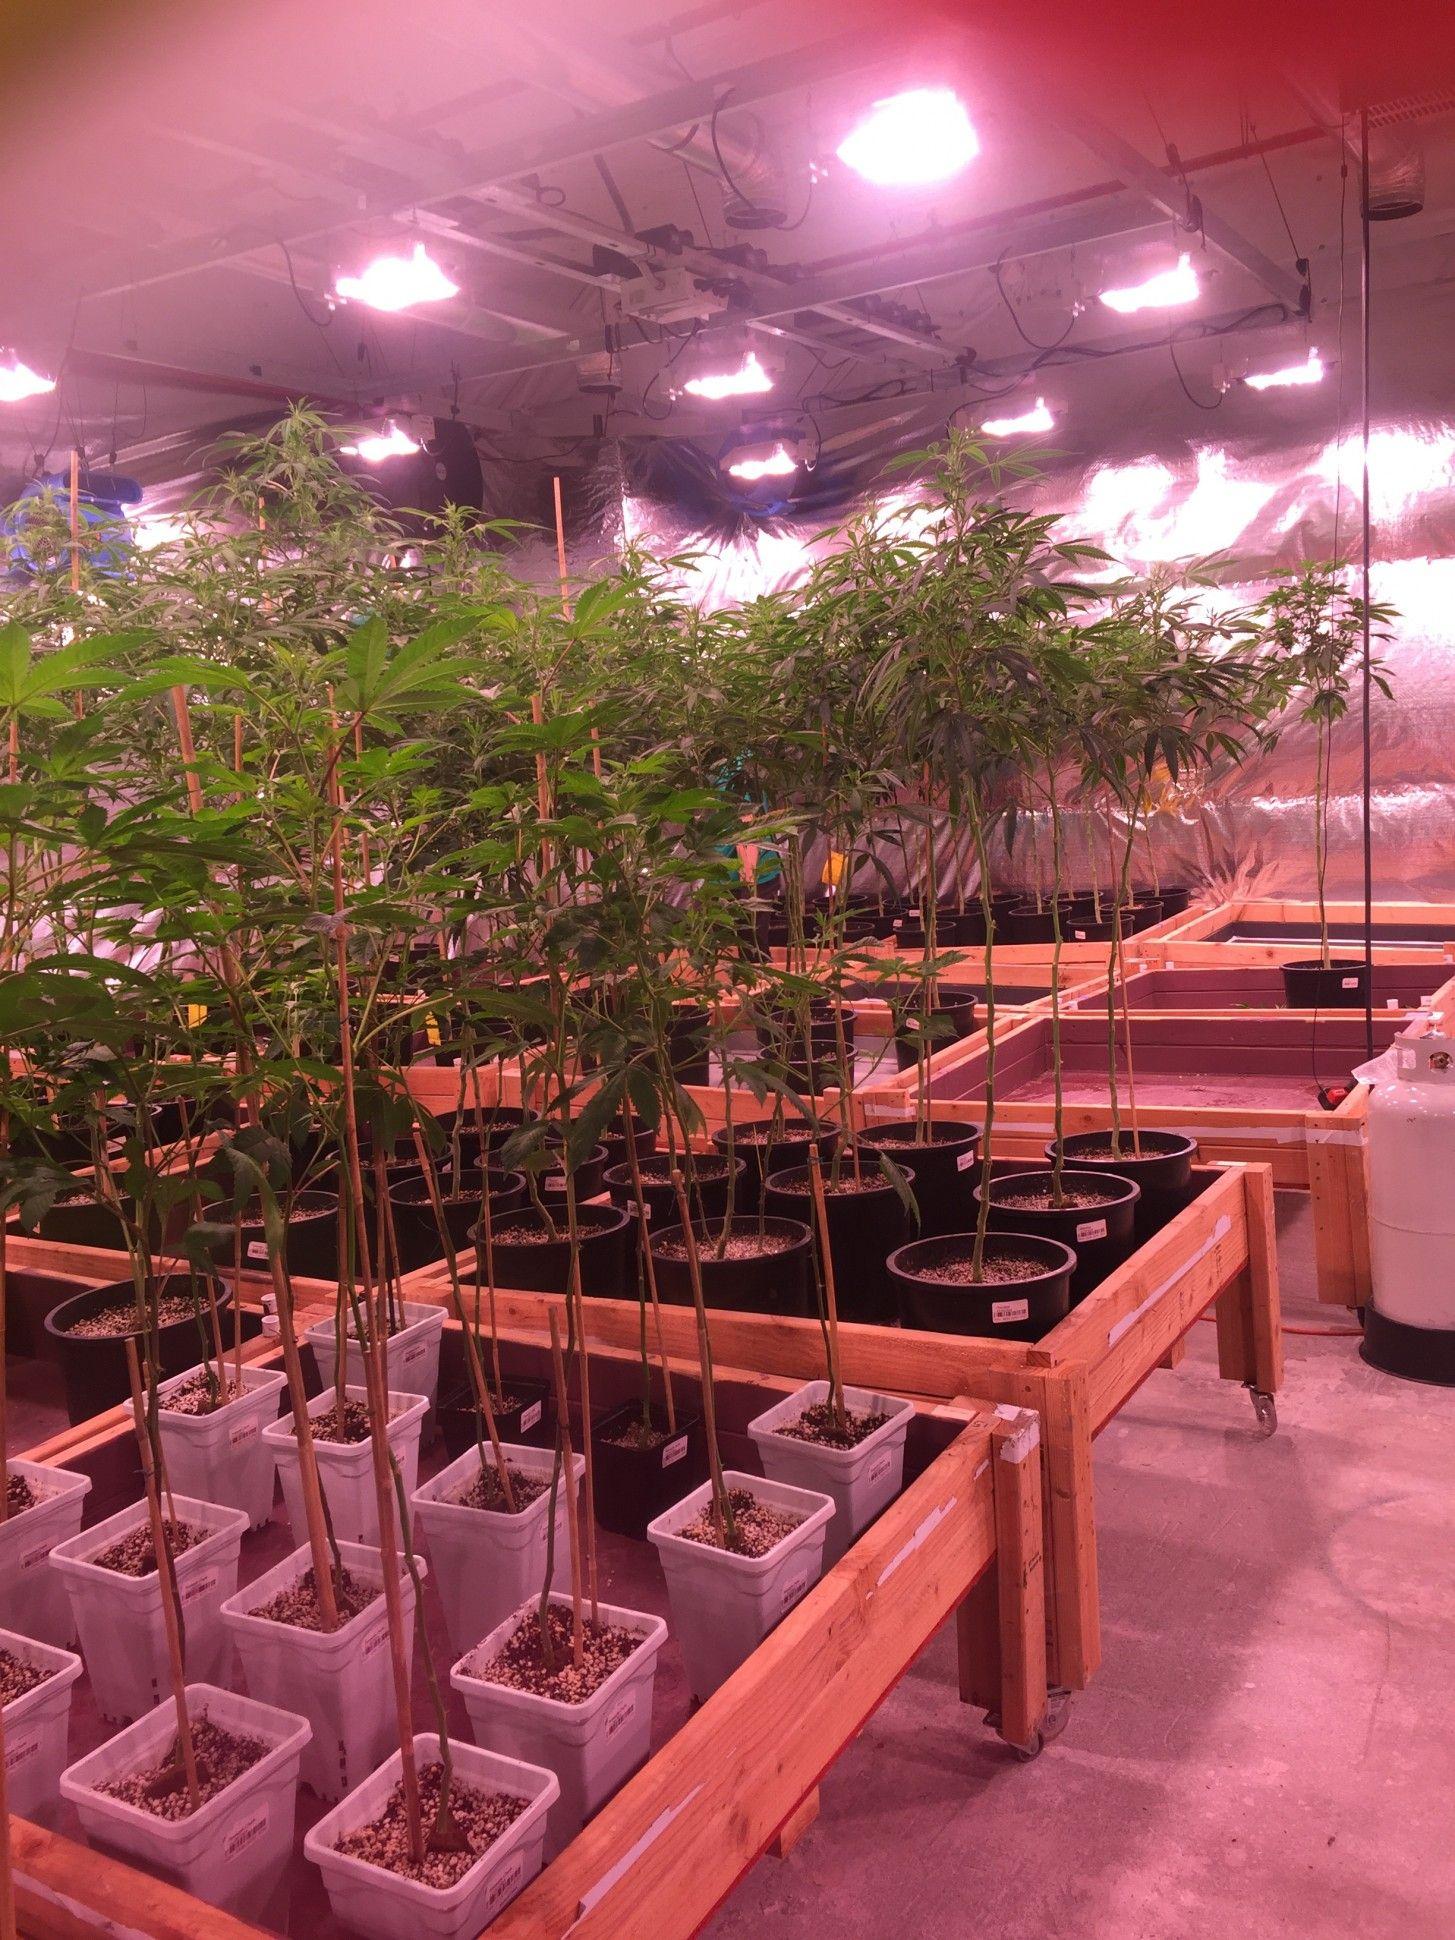 Four Cannabis Entrepreneurs Share Their Strangest Moments ...